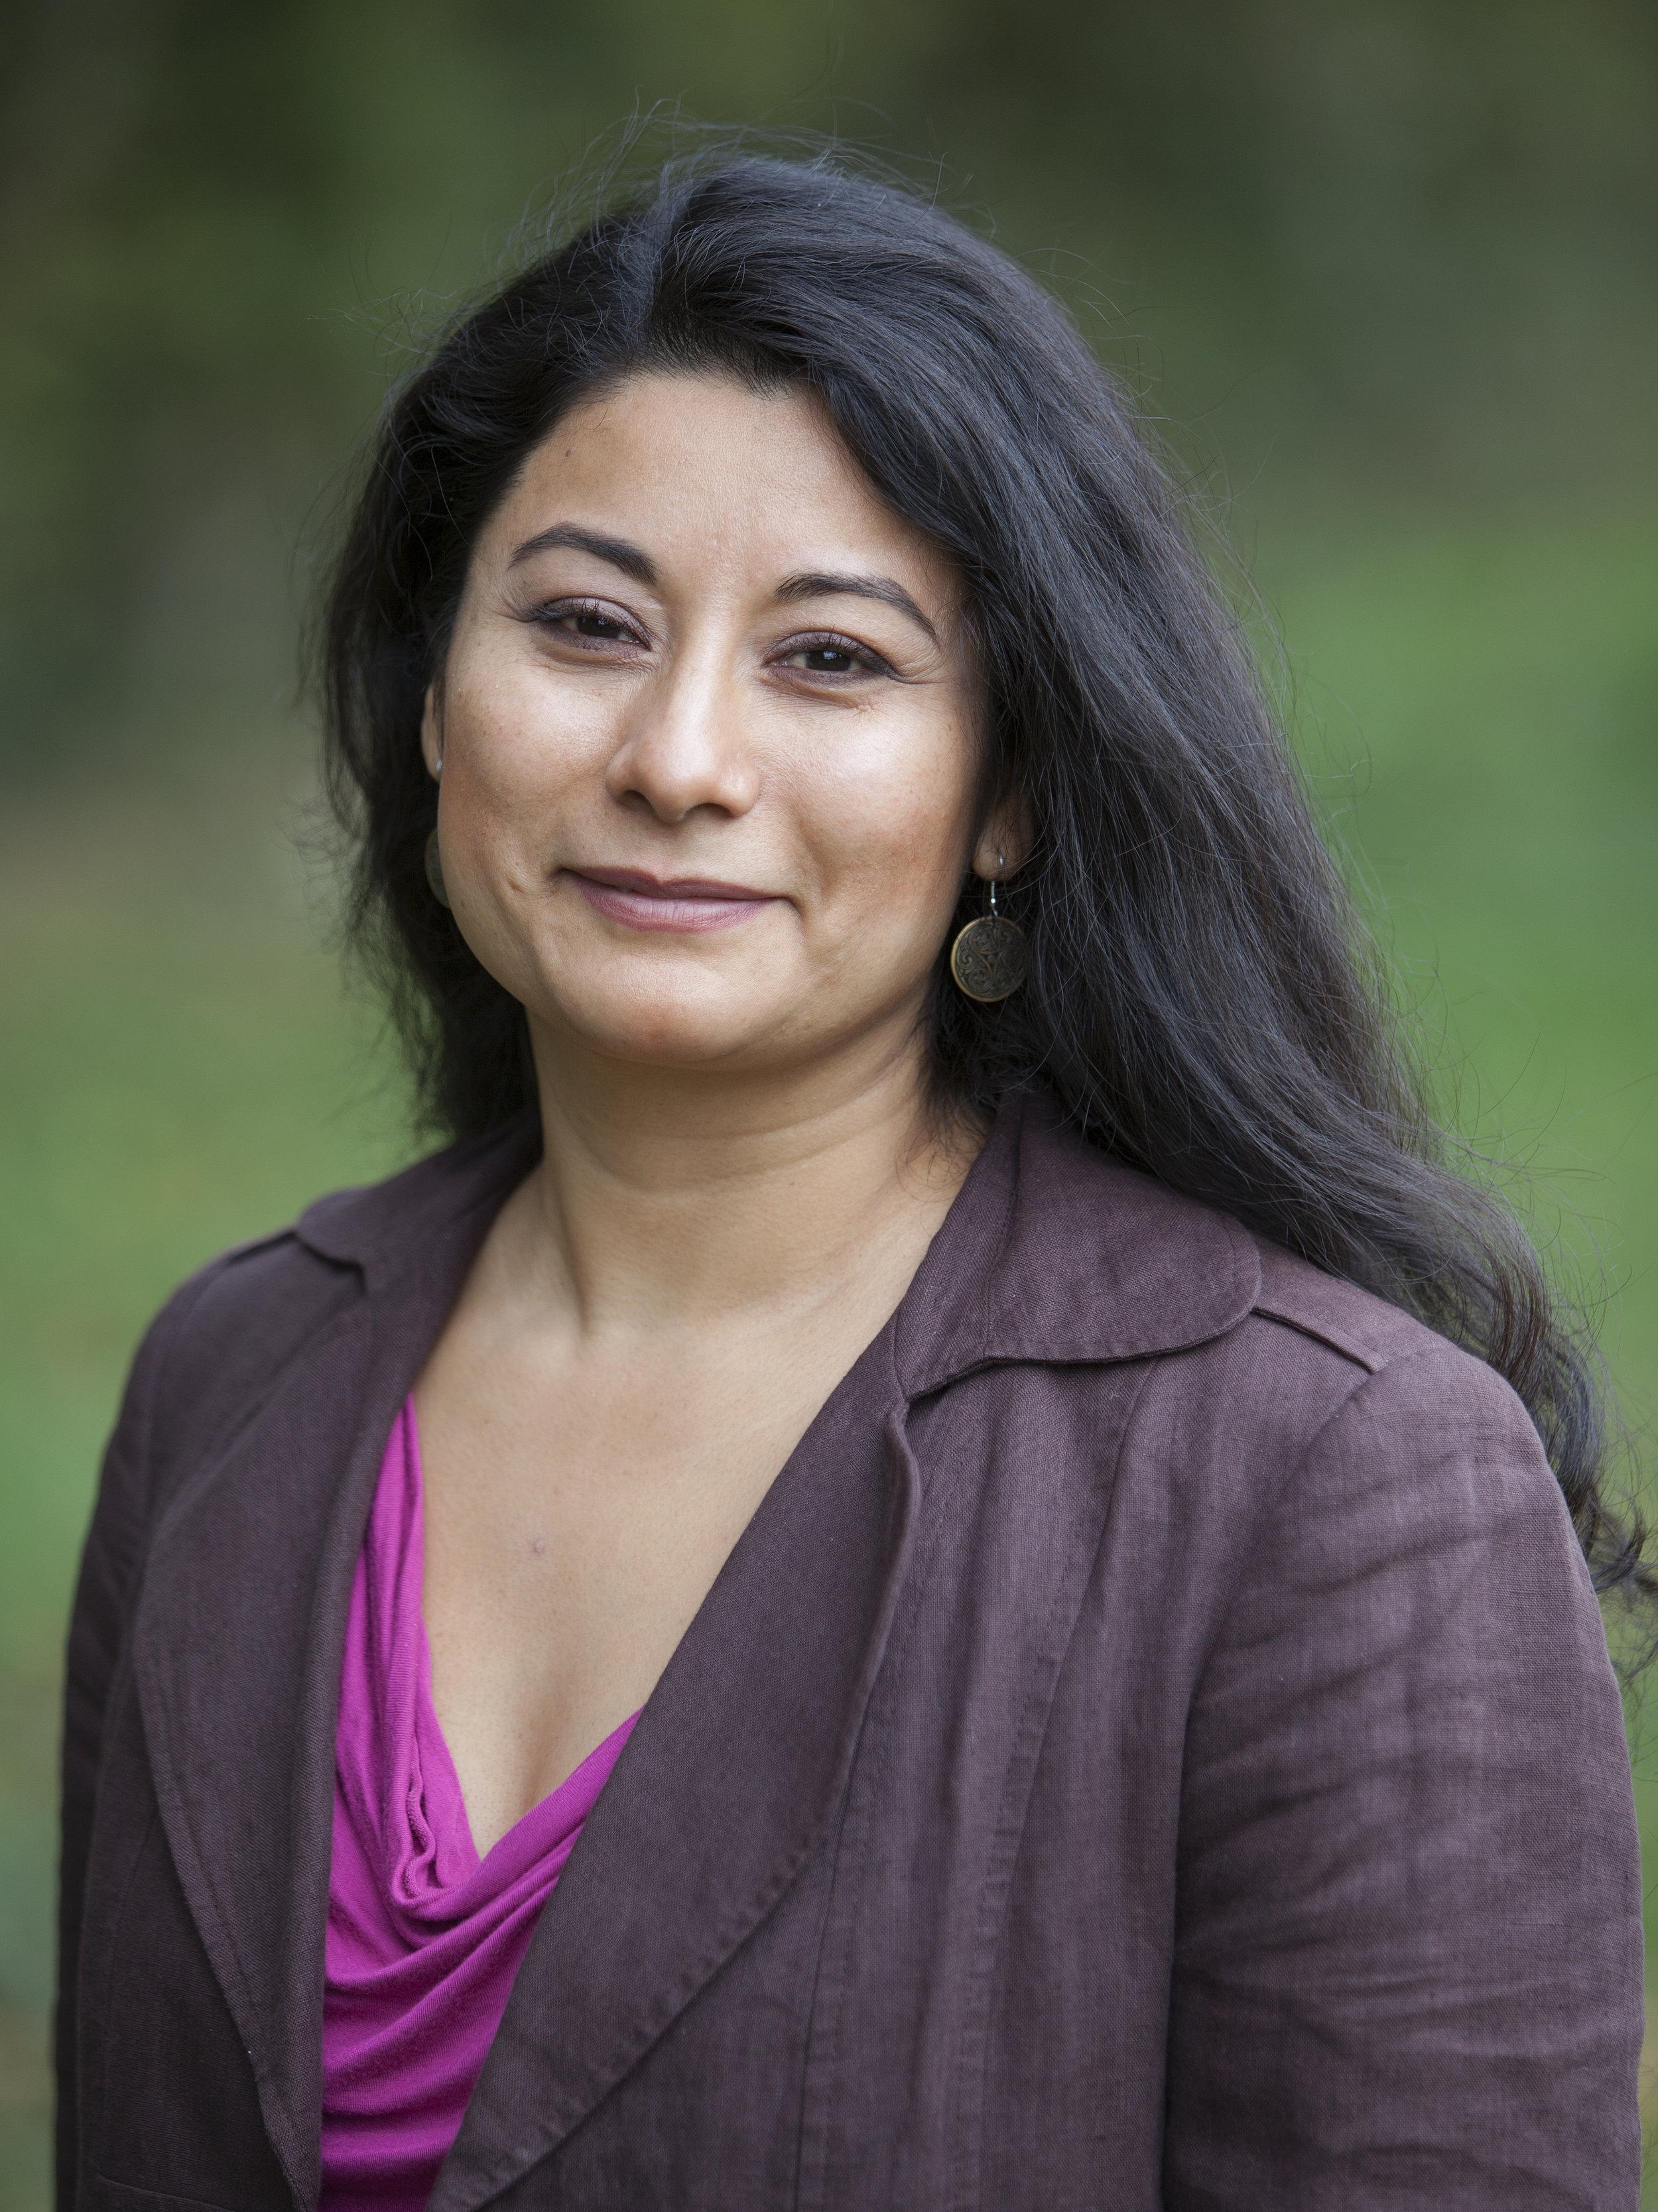 Brenda Ramirez Matias - BSc, PGDip